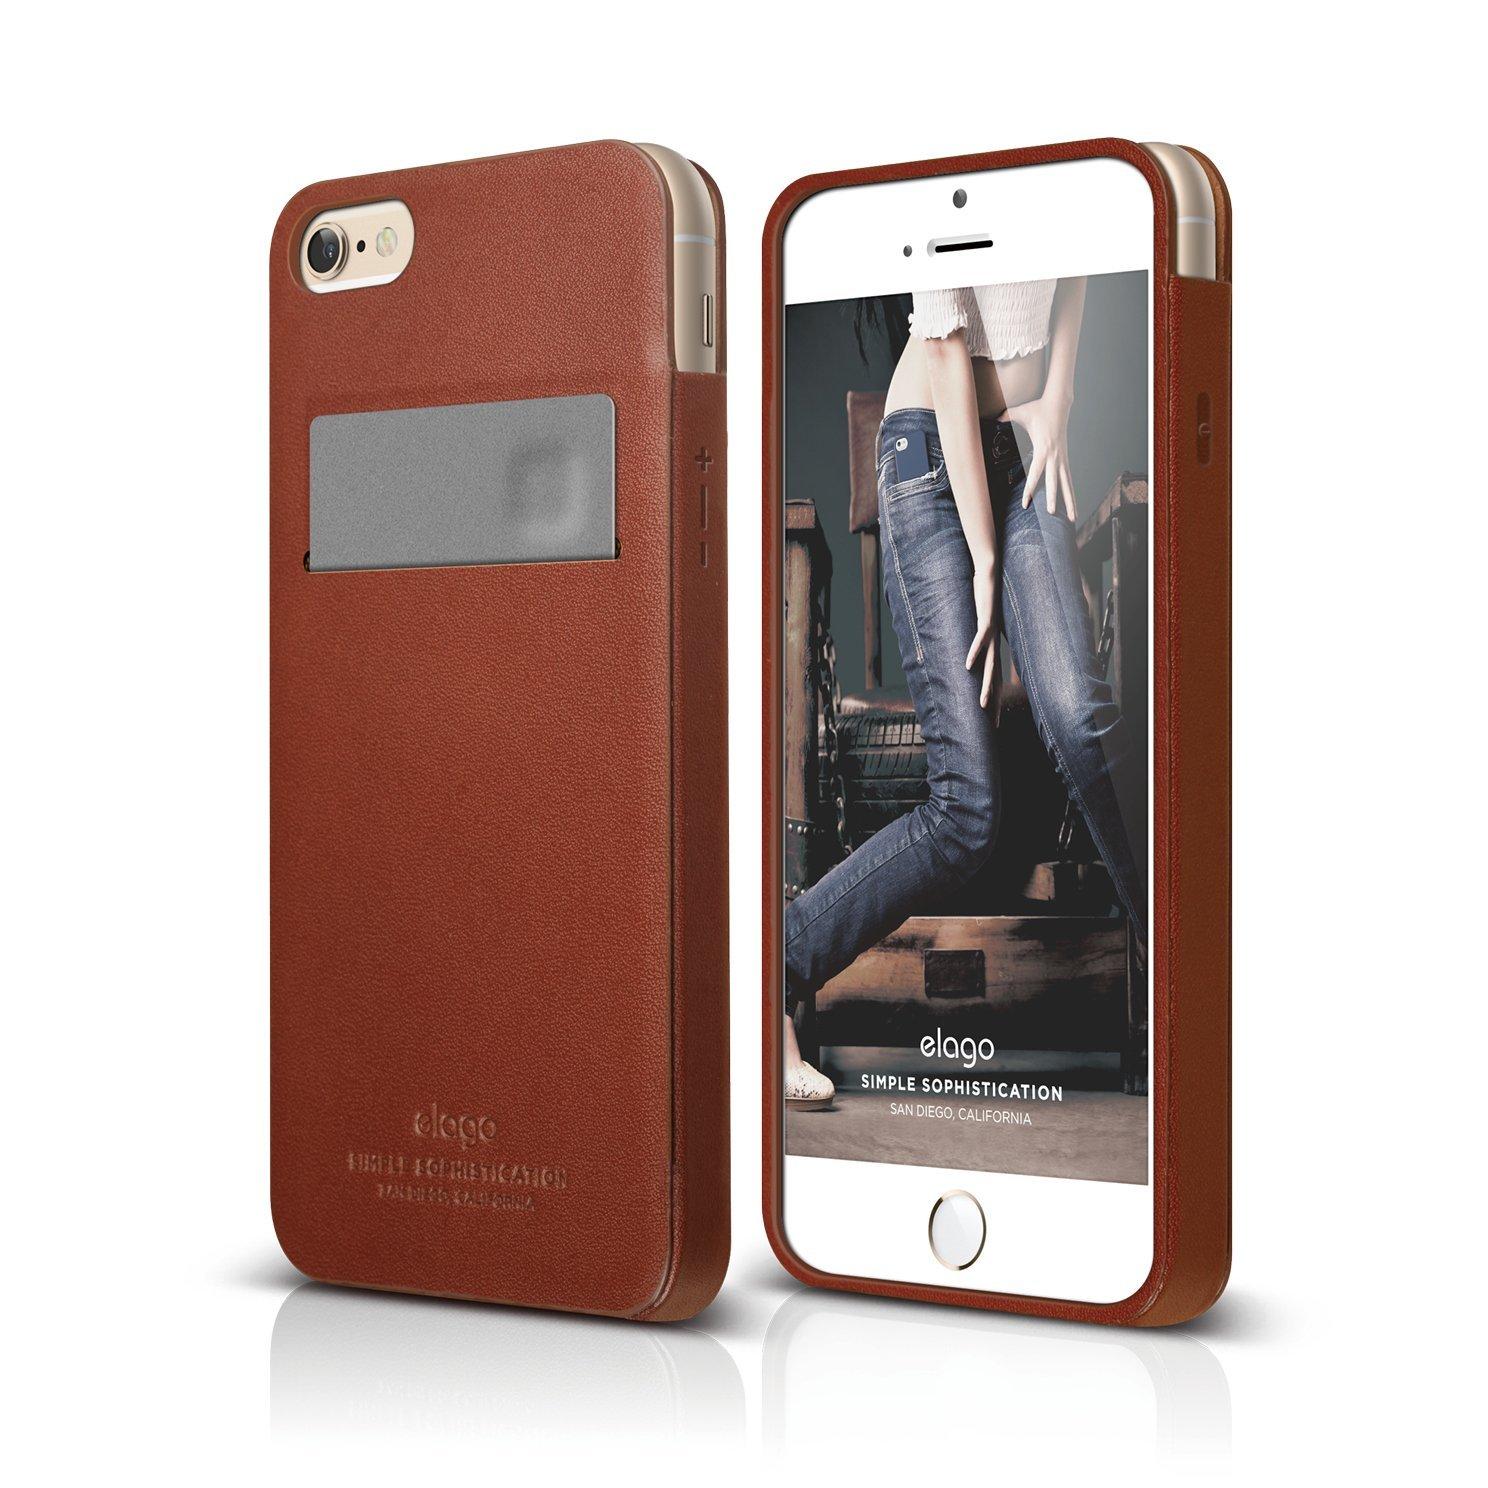 S6 Genuine Leather Pocket Case For Iphone 6 6s Elago Europe